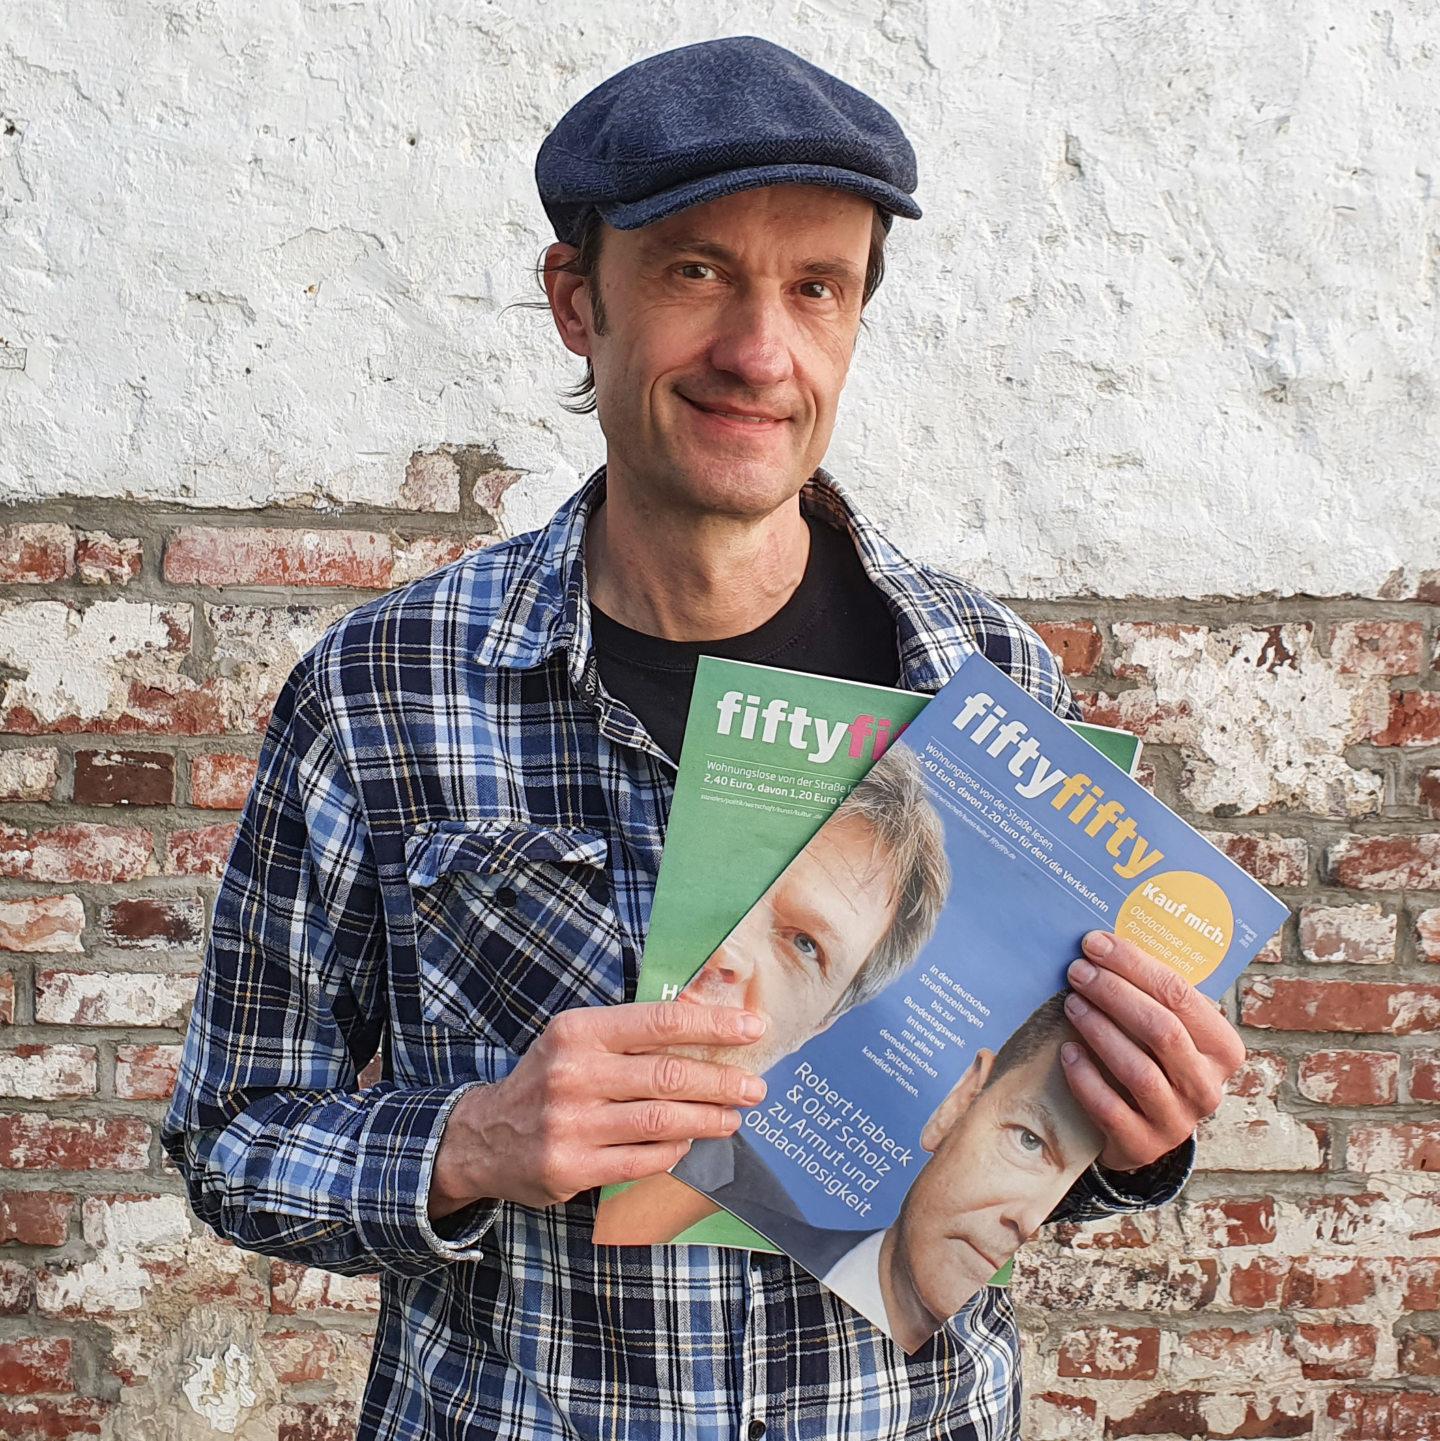 Digital-Soli-Abo: Straßenmagazin fiftyfifty in Gefahr ...